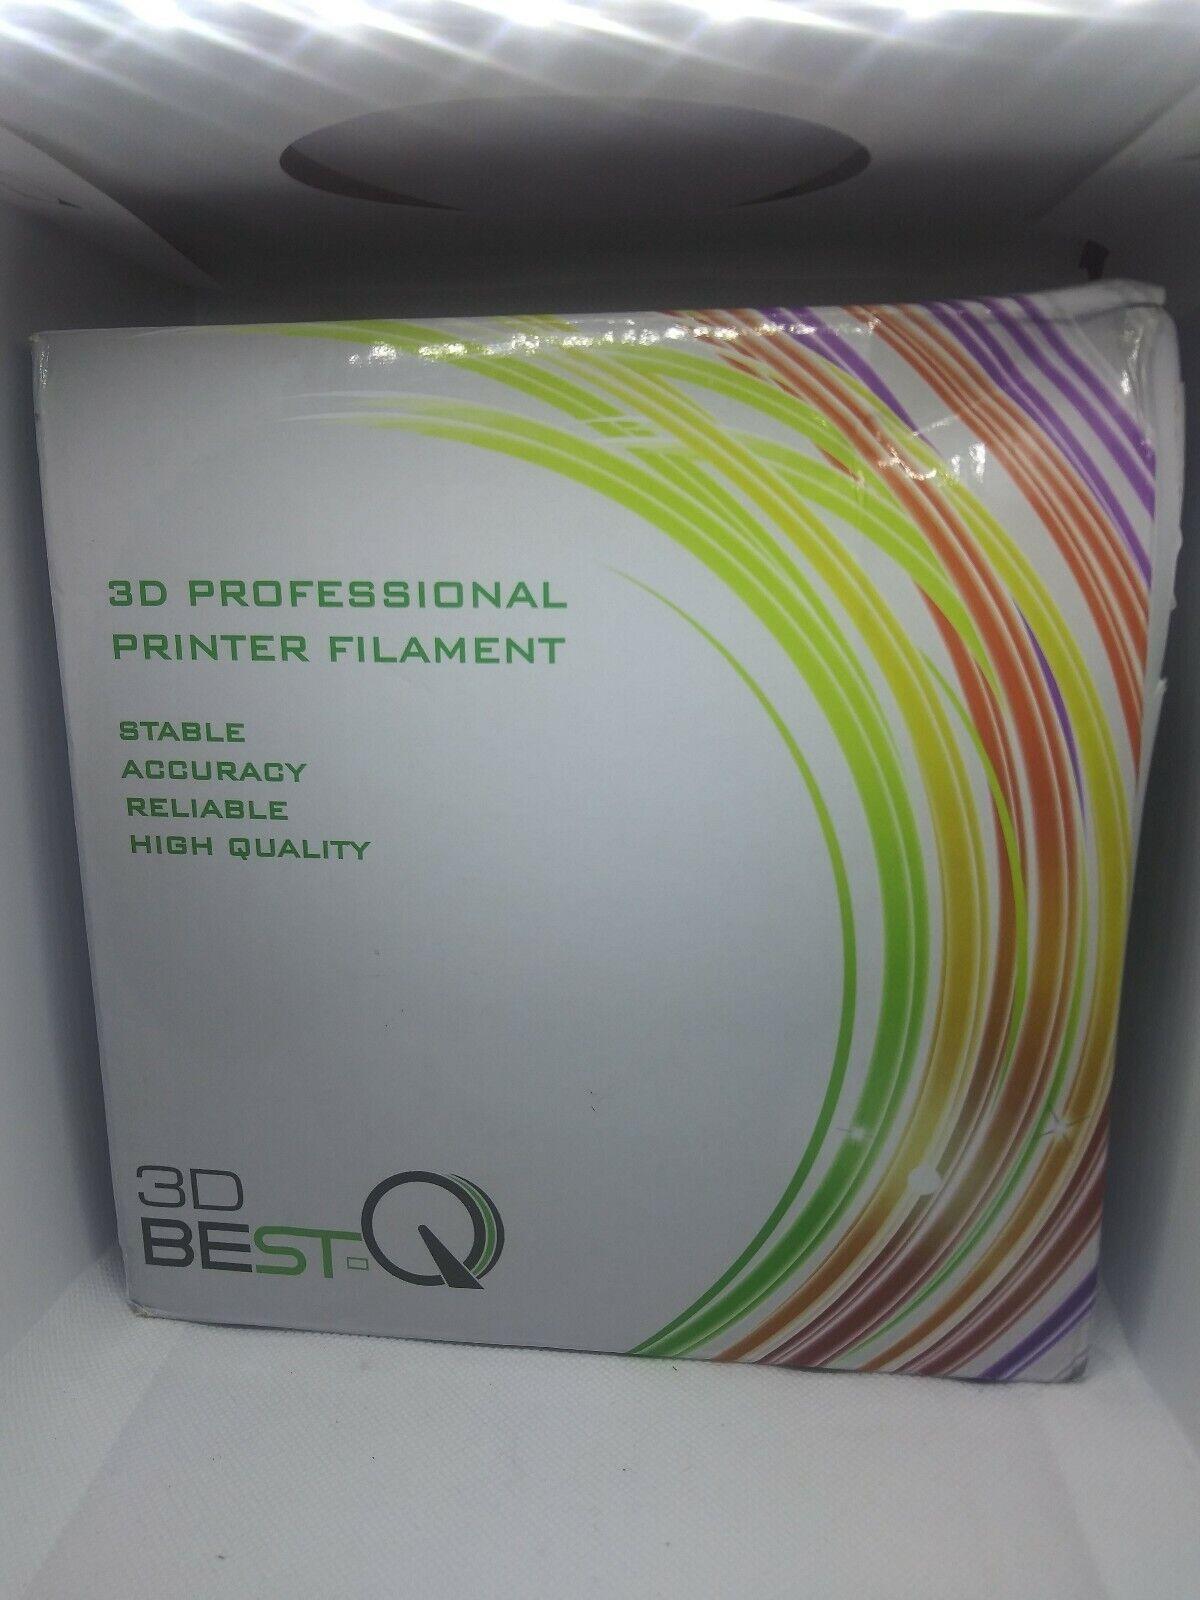 BEST-Q White 3D Printer Professional Filament 3D Best